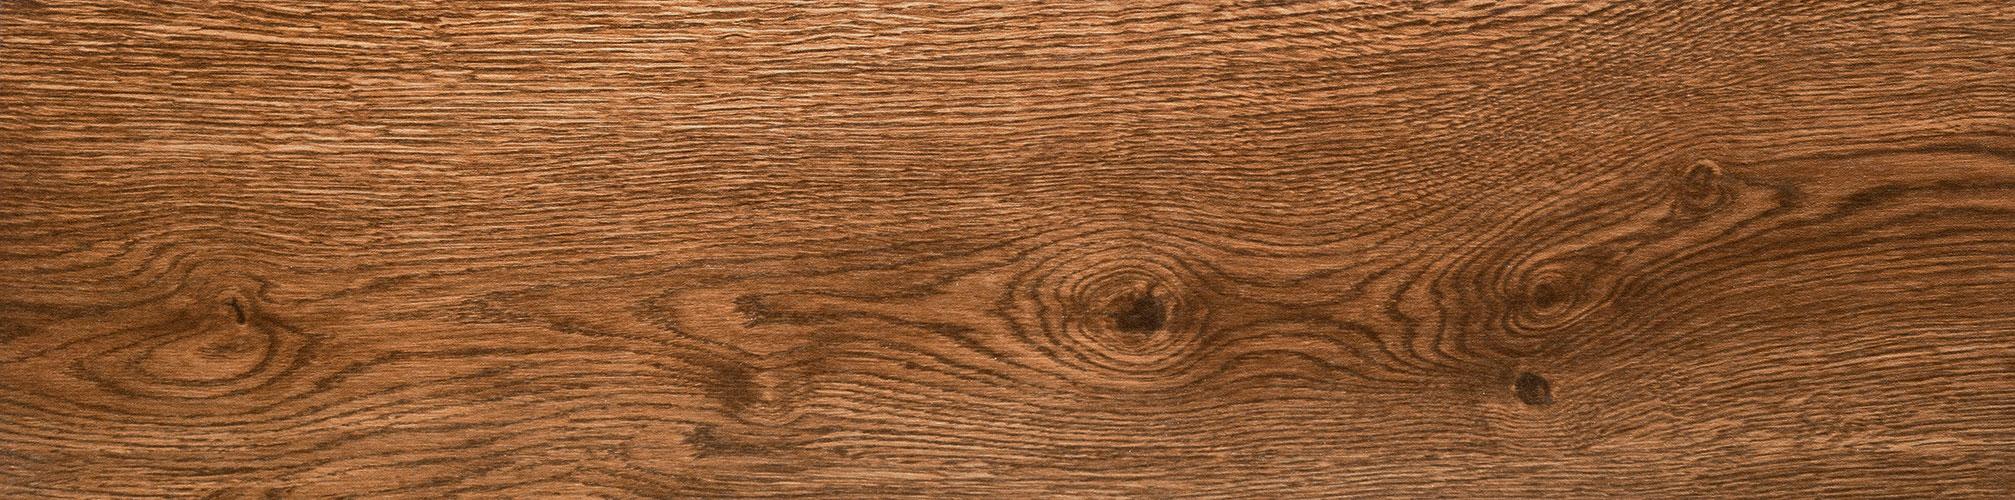 Barbados wood brown STR